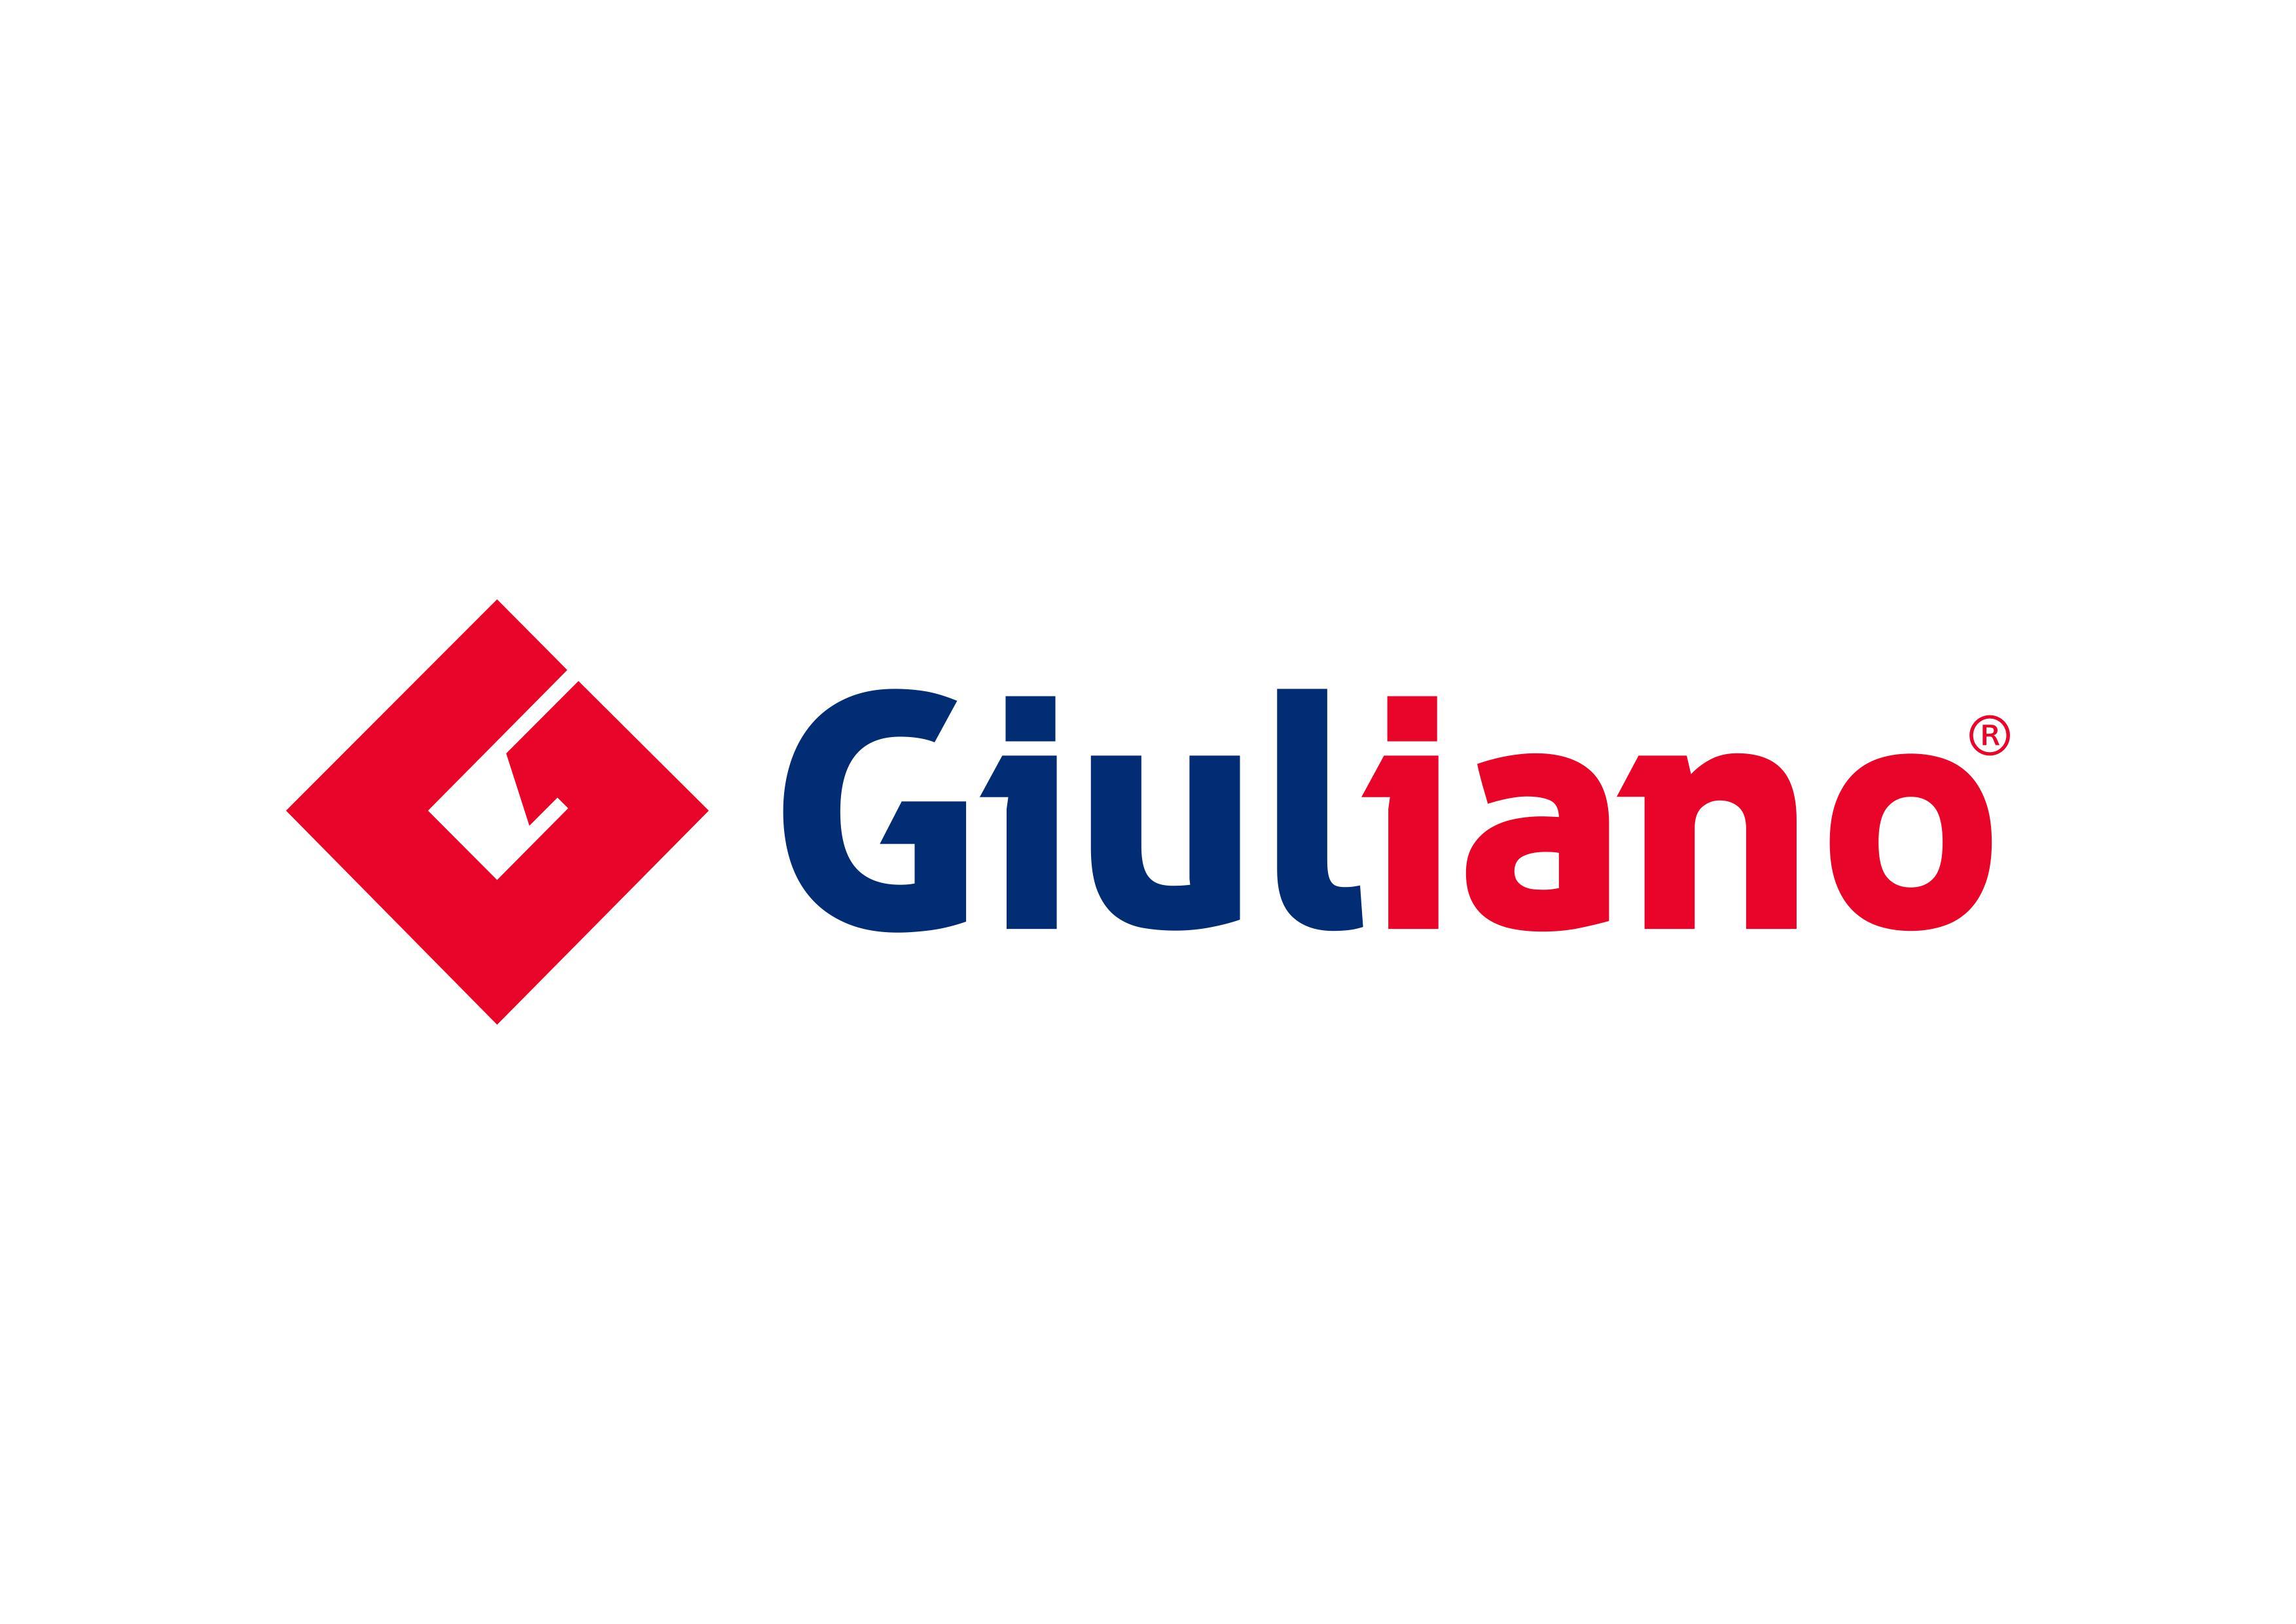 giulianogroup